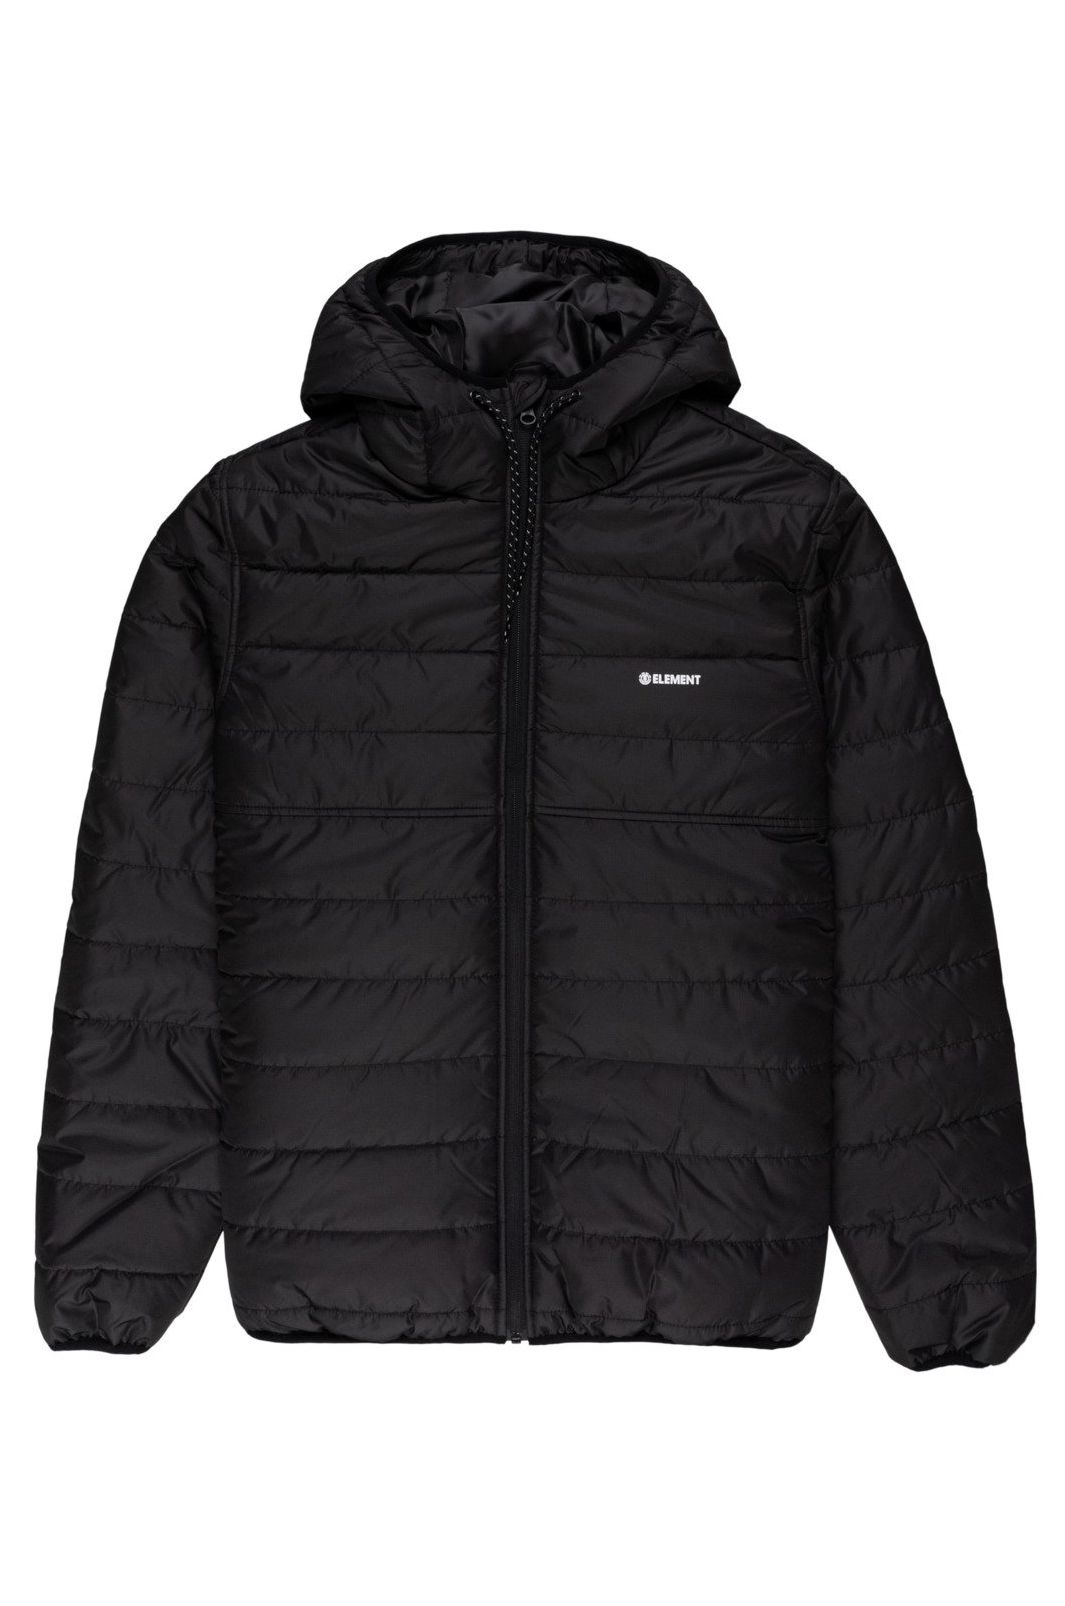 Element Jacket ALDER PUFF FUNDAMENT SPORTING GOOD PROGR. Flint Black